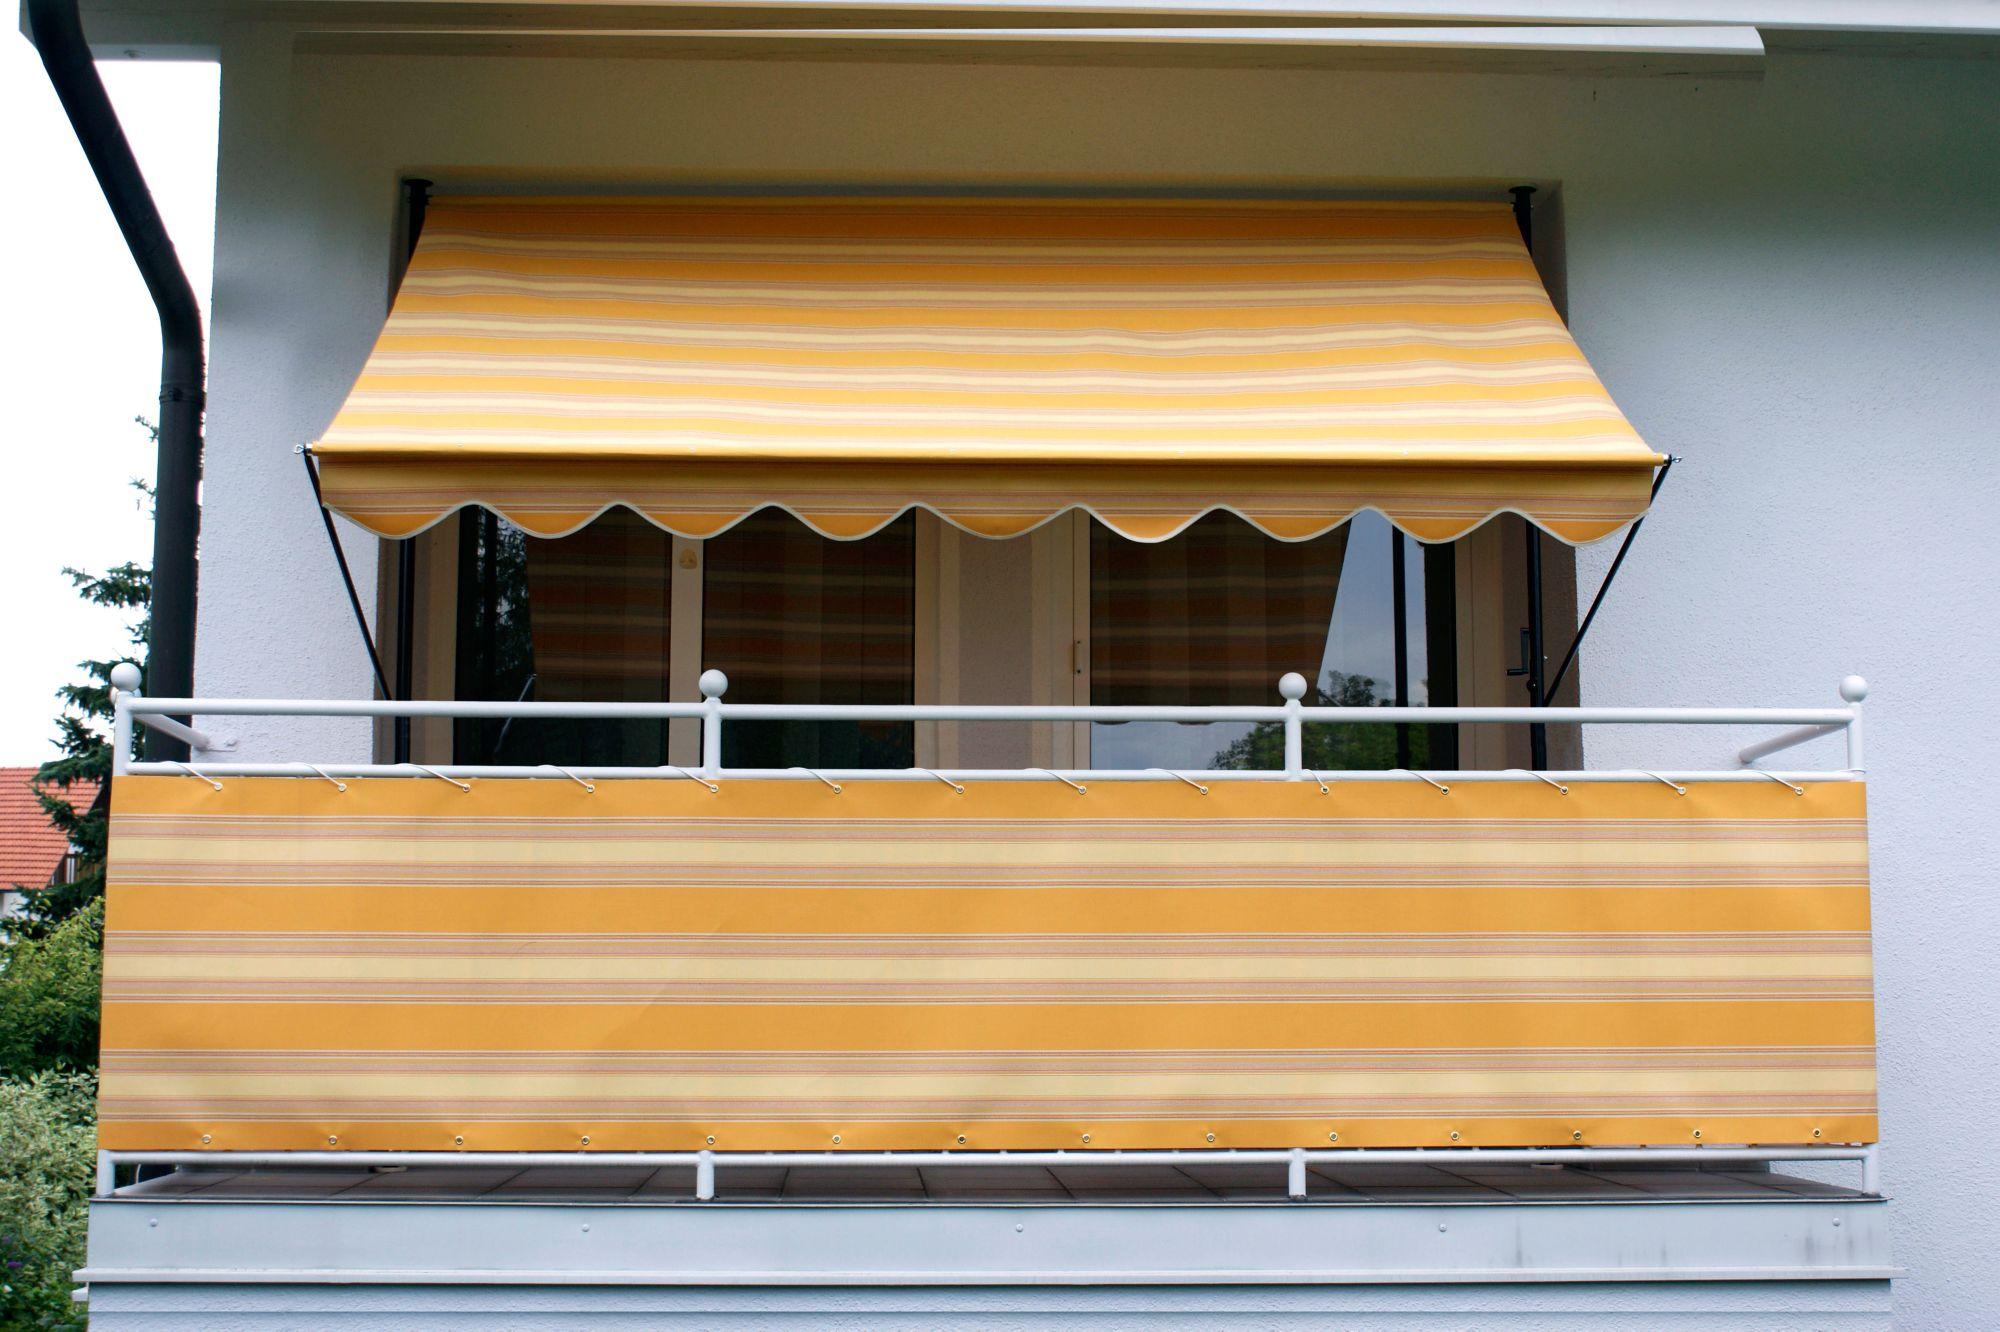 klemmmarkise 300 cm klemmmarkise anthrazit breite 300 cm klemmmarkise orange braun breite 300. Black Bedroom Furniture Sets. Home Design Ideas